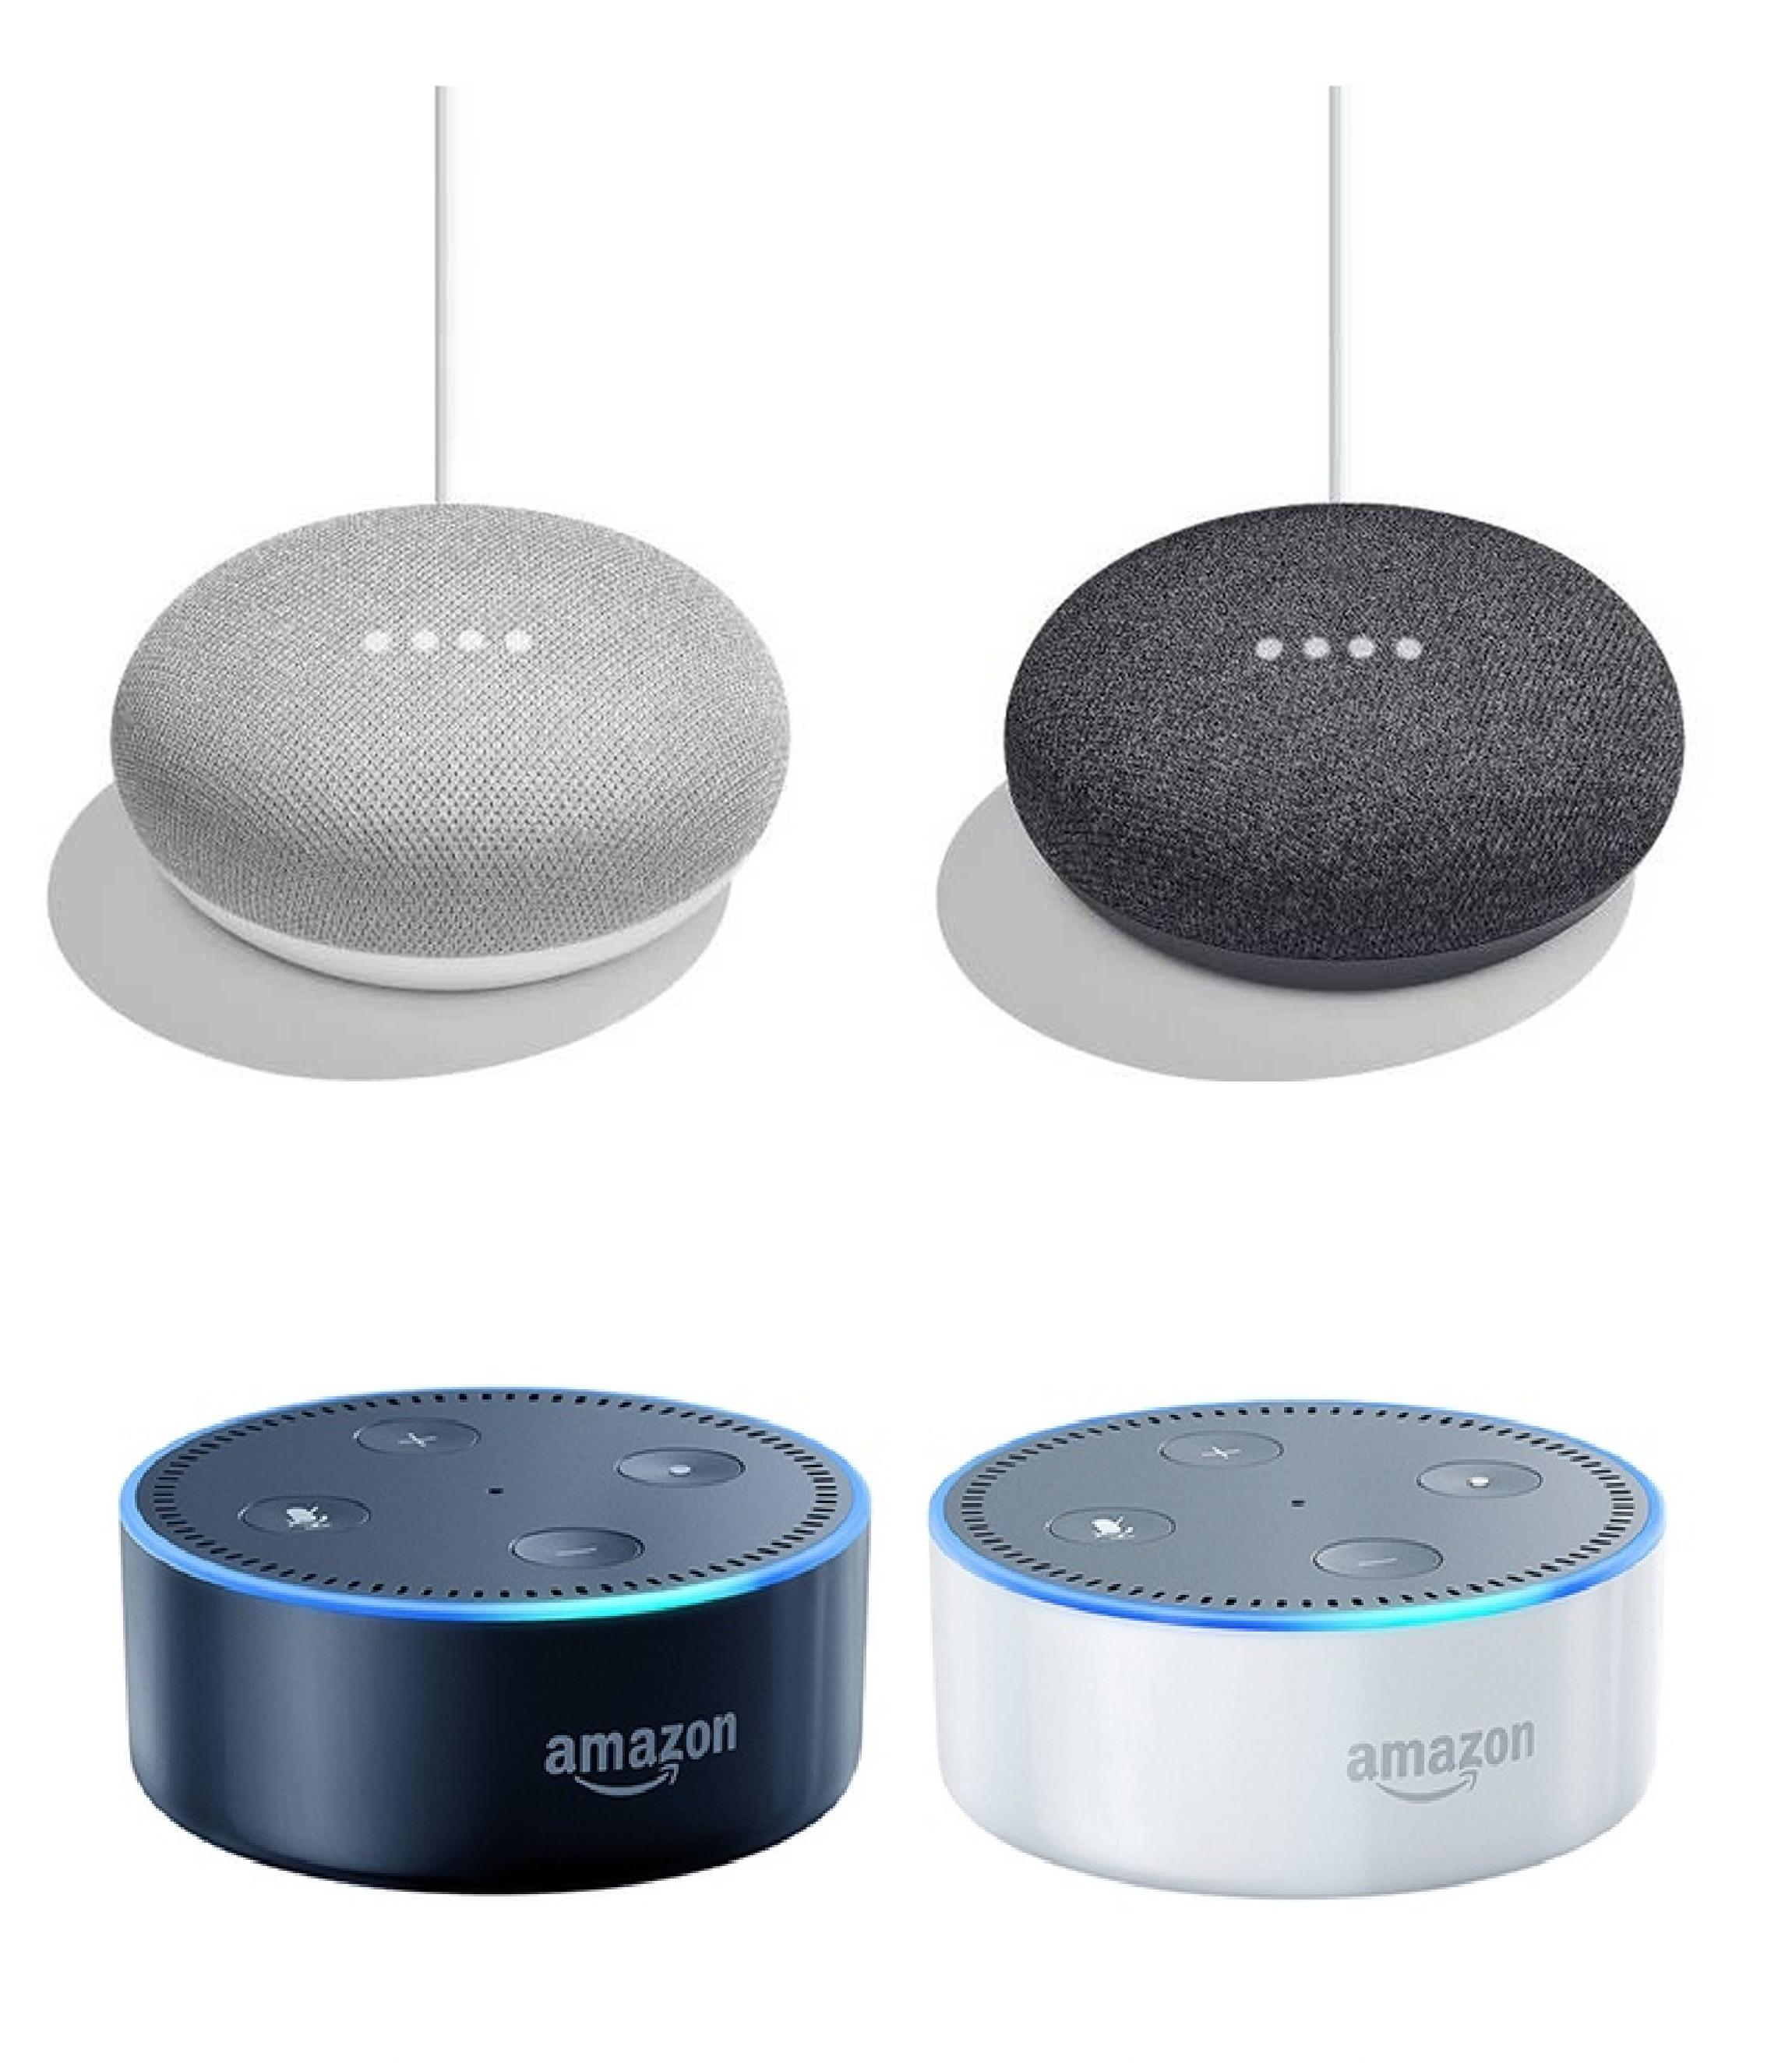 Amazon Echo Dot Black or White £39.99 // Google Home Mini Chalk or Charcoal £34 with 2 year guarantee Free C&C @ John Lewis